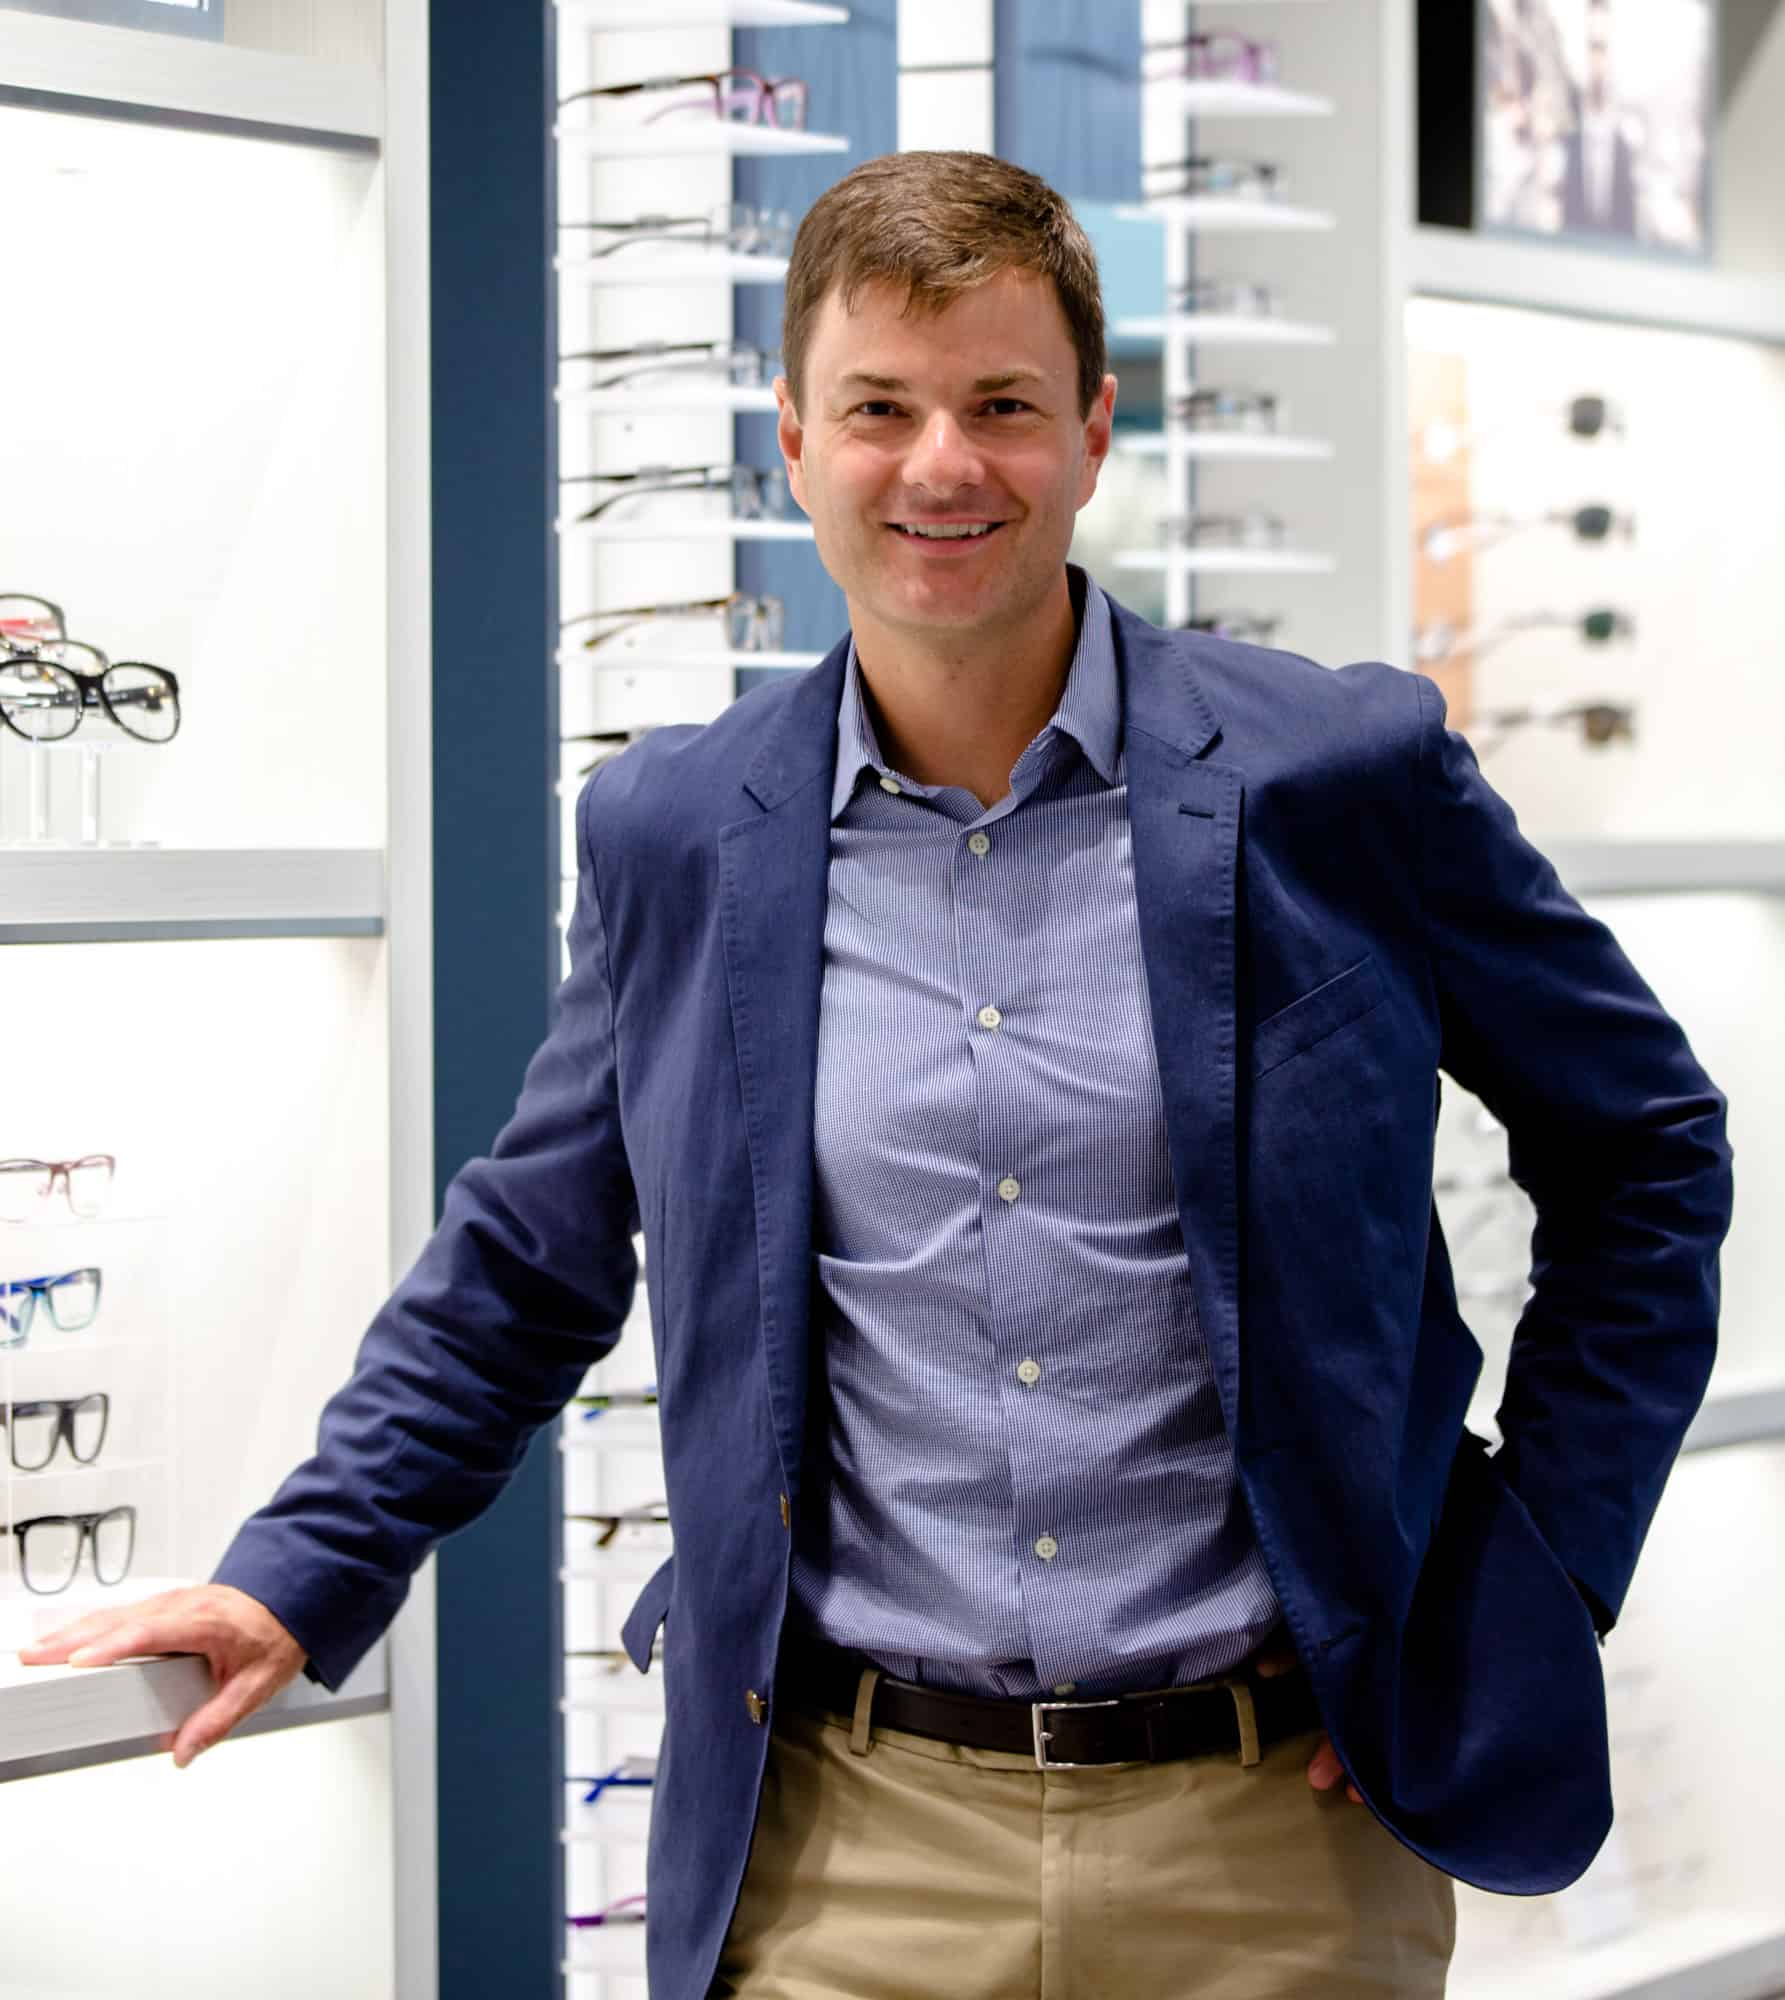 Wilmington, NC Ophthalmologist Dr. Gregory J. Johnson